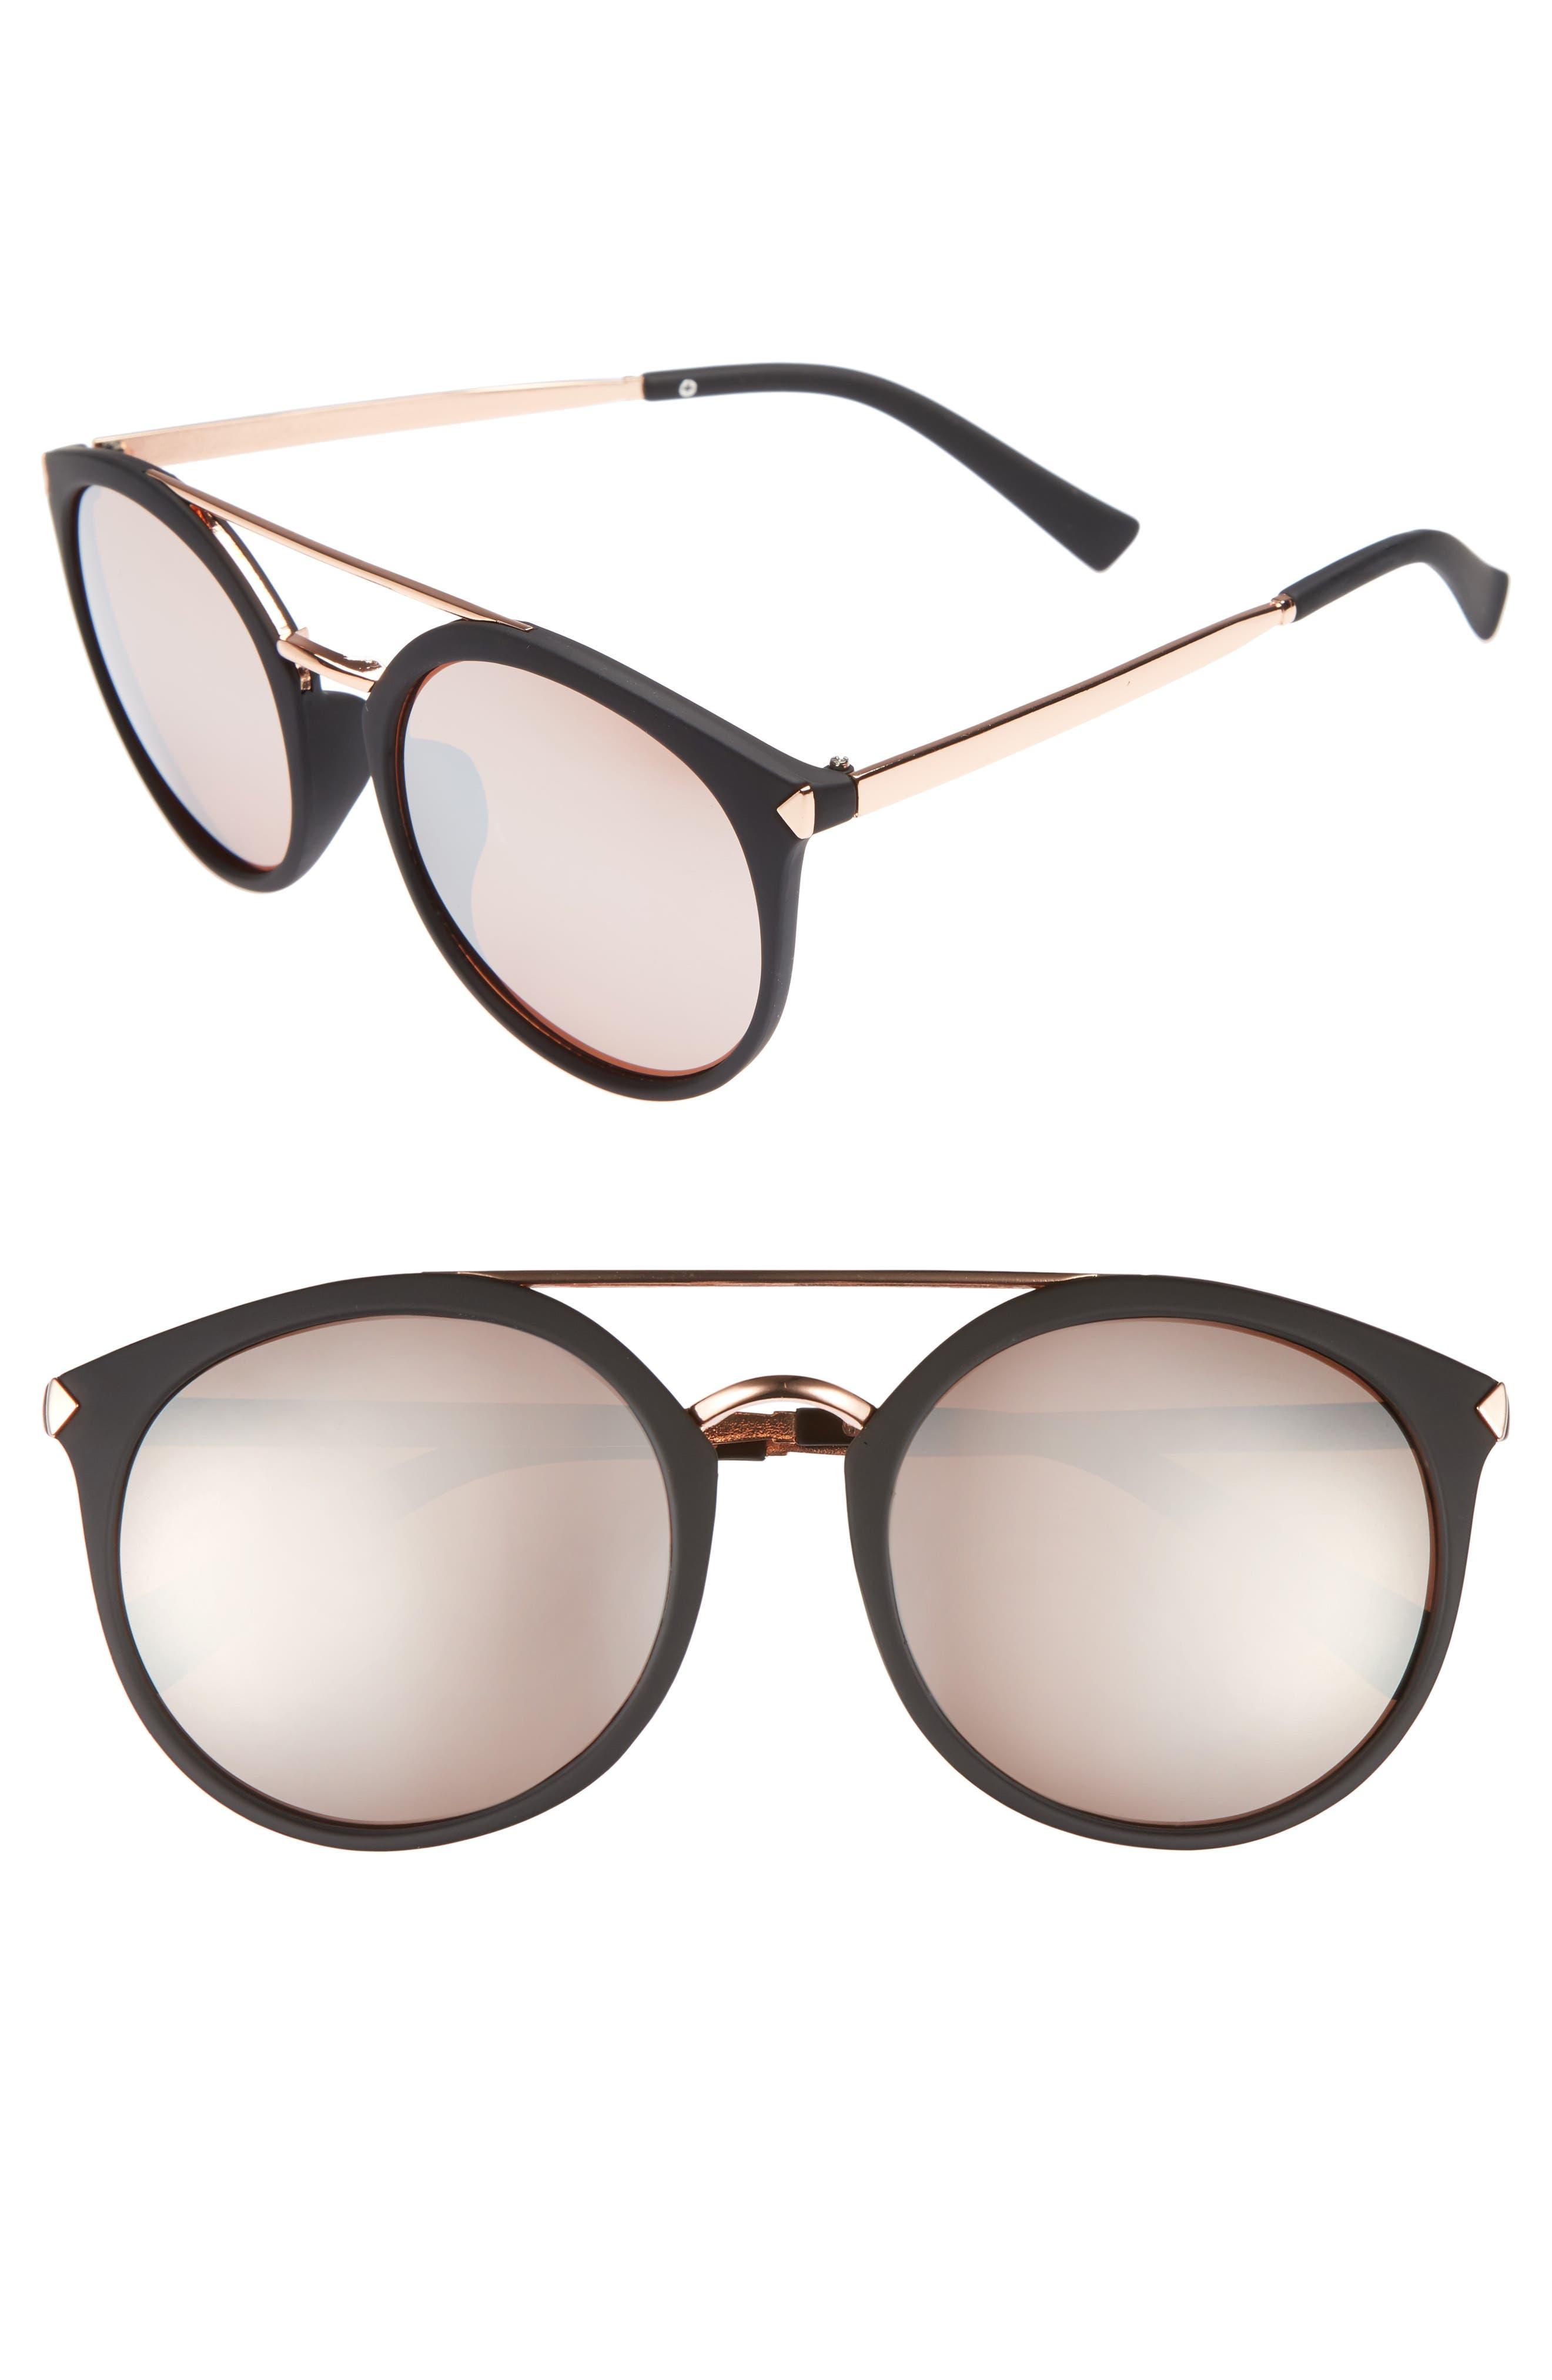 55mm Mirrored Sunglasses,                             Main thumbnail 1, color,                             Black/ Rose Gold